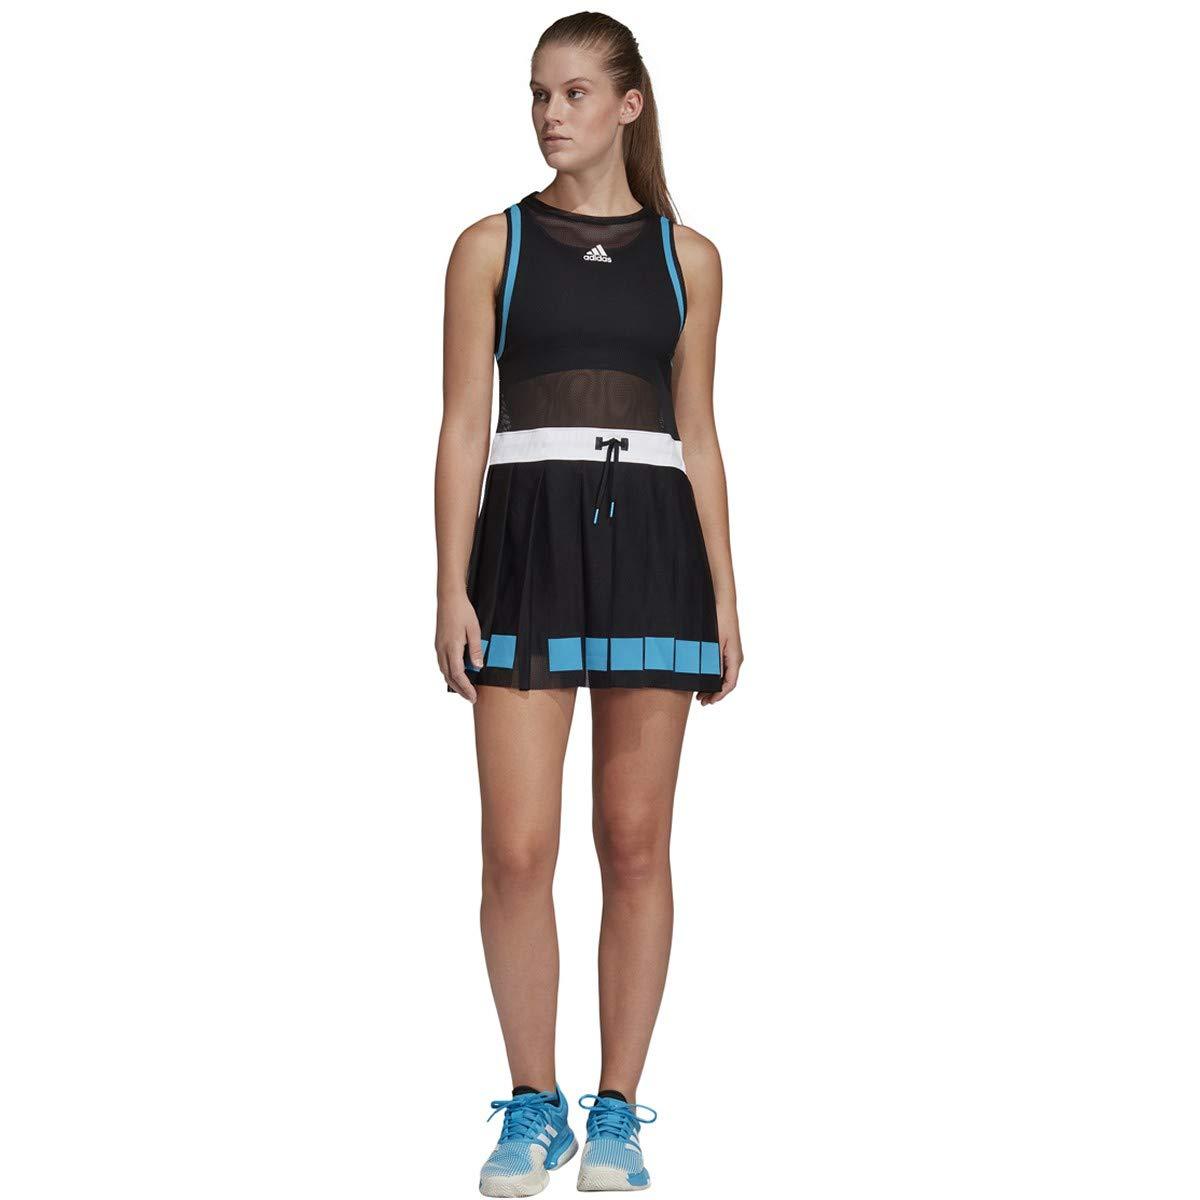 adidas Escouade Tennis Dress, Black/White (XX-Small)